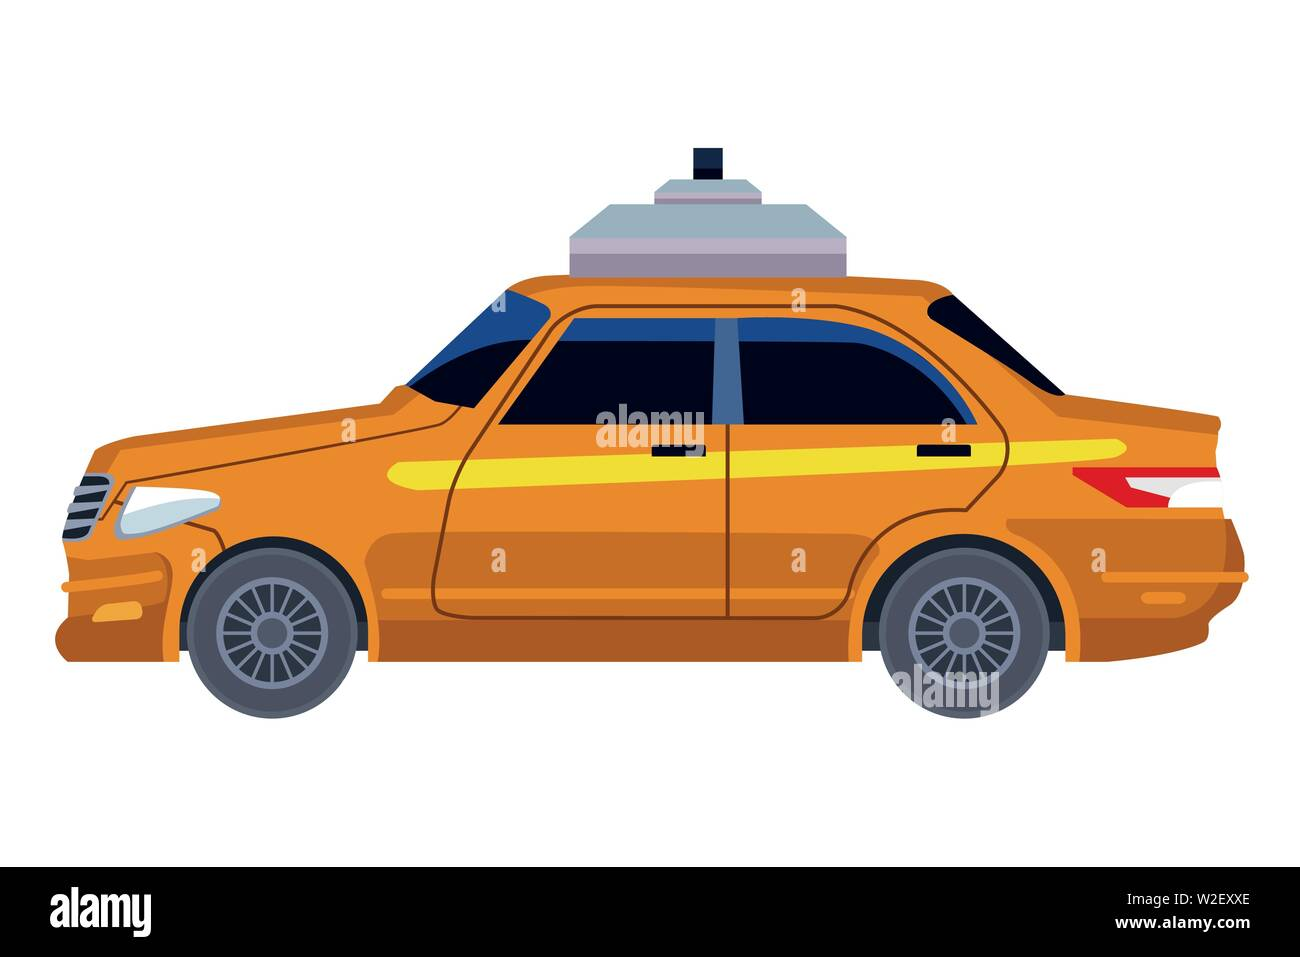 taxi cab car icon cartoon - Stock Image